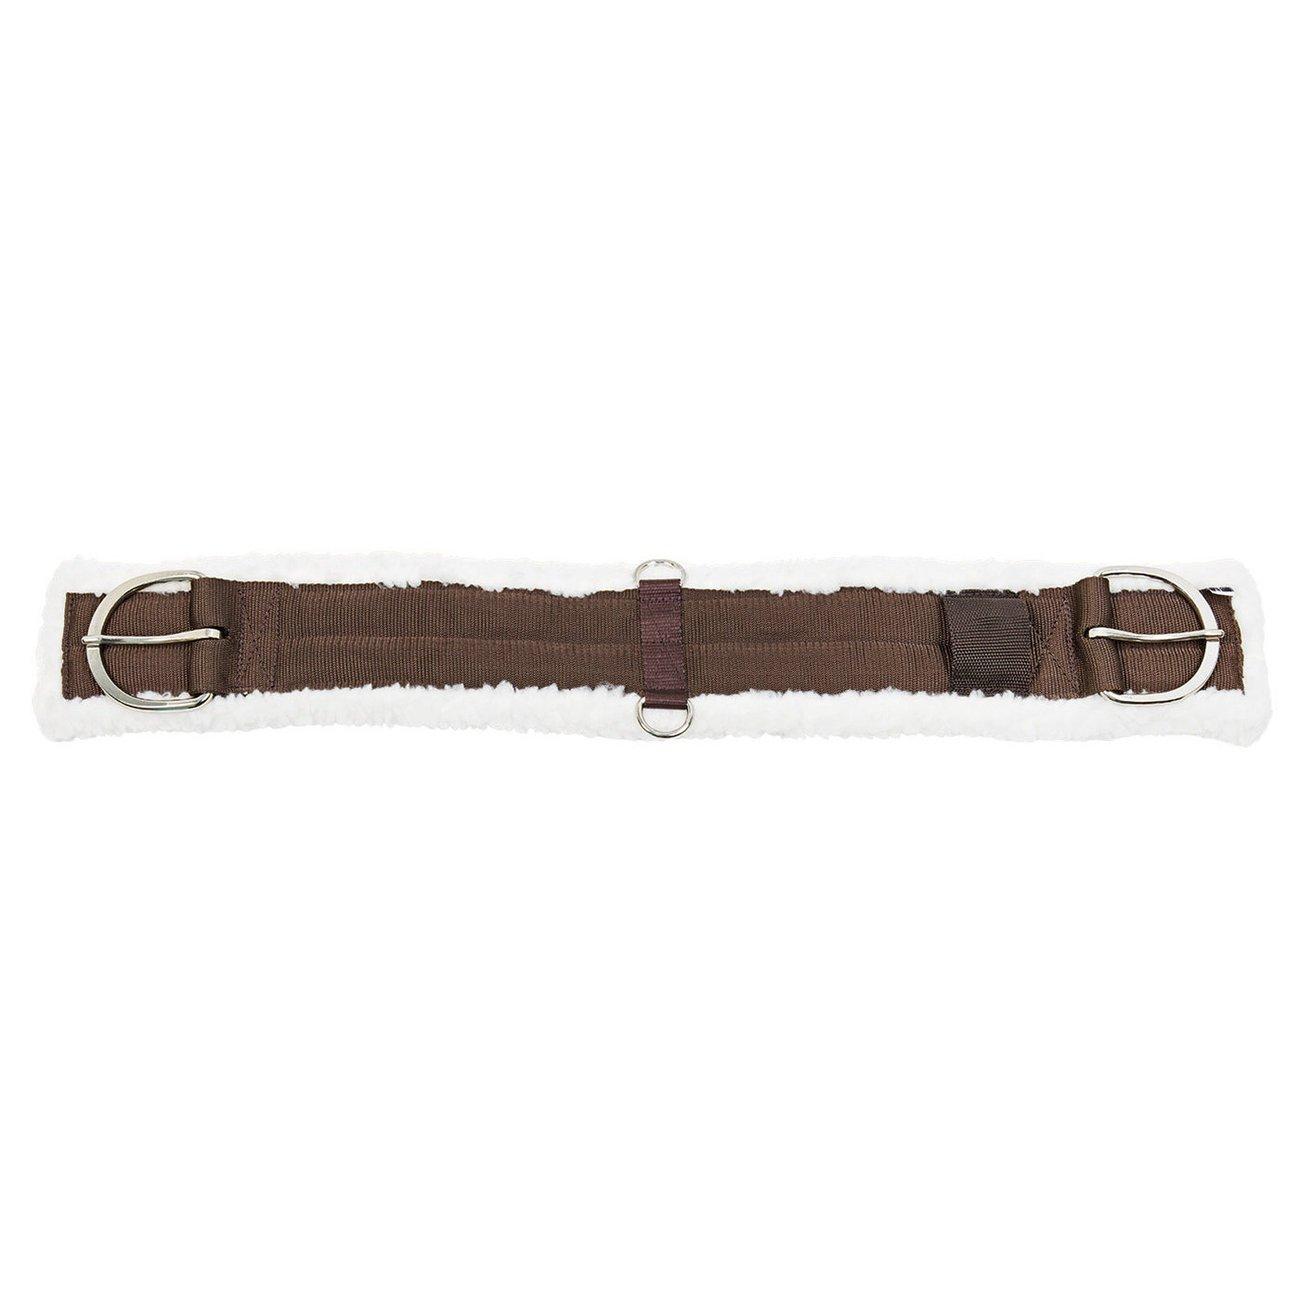 BUSSE Sattelgurt Vestan Western, 28 inch, 70 cm, braun